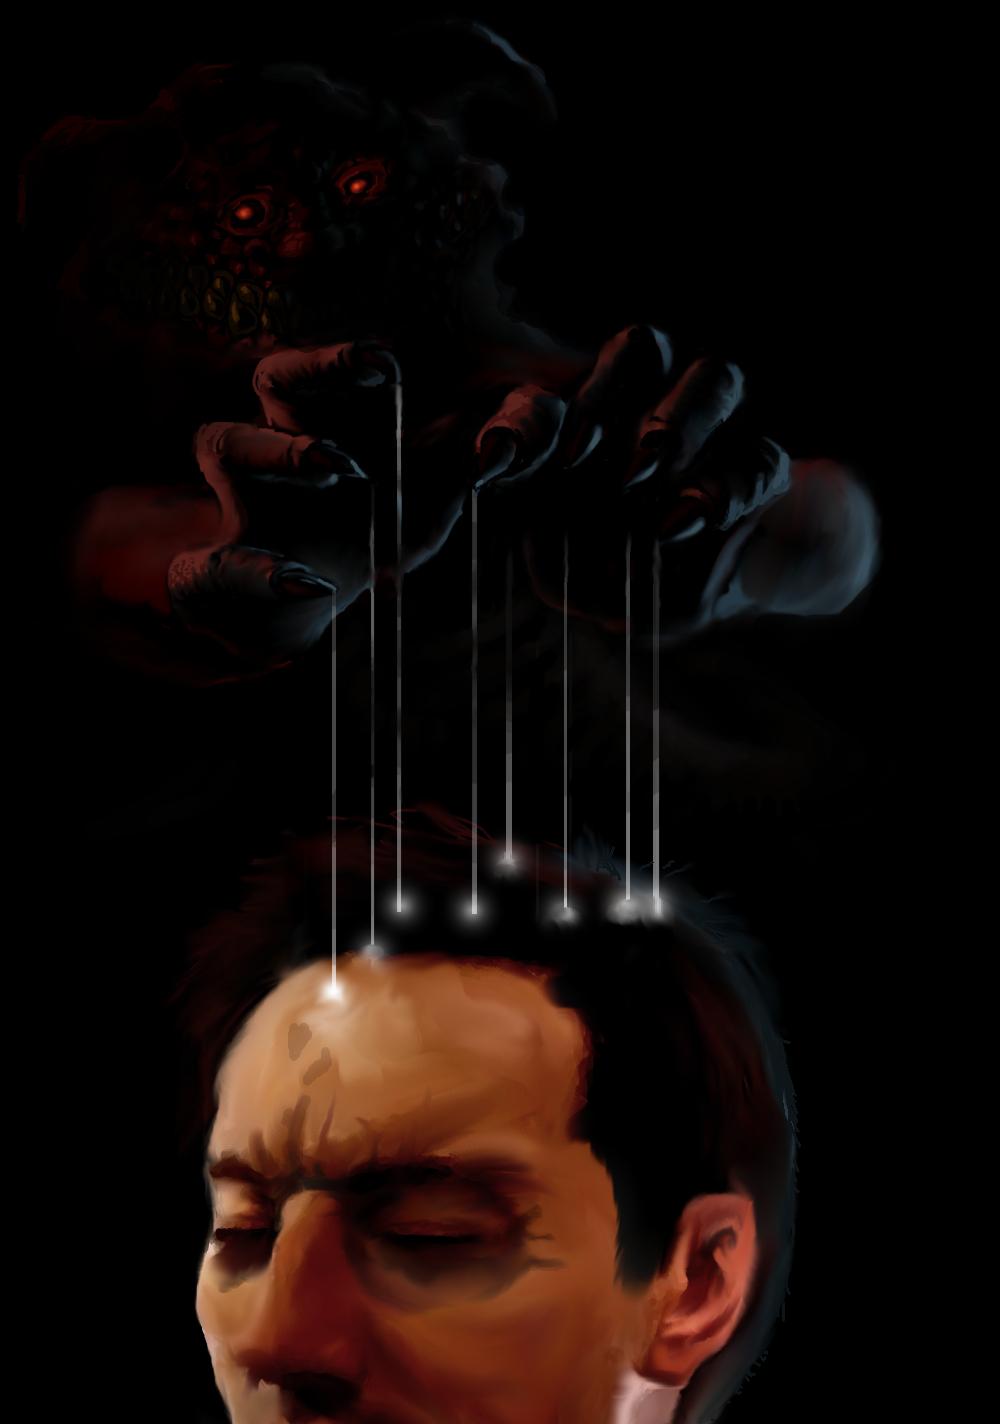 Demonic Mind Control